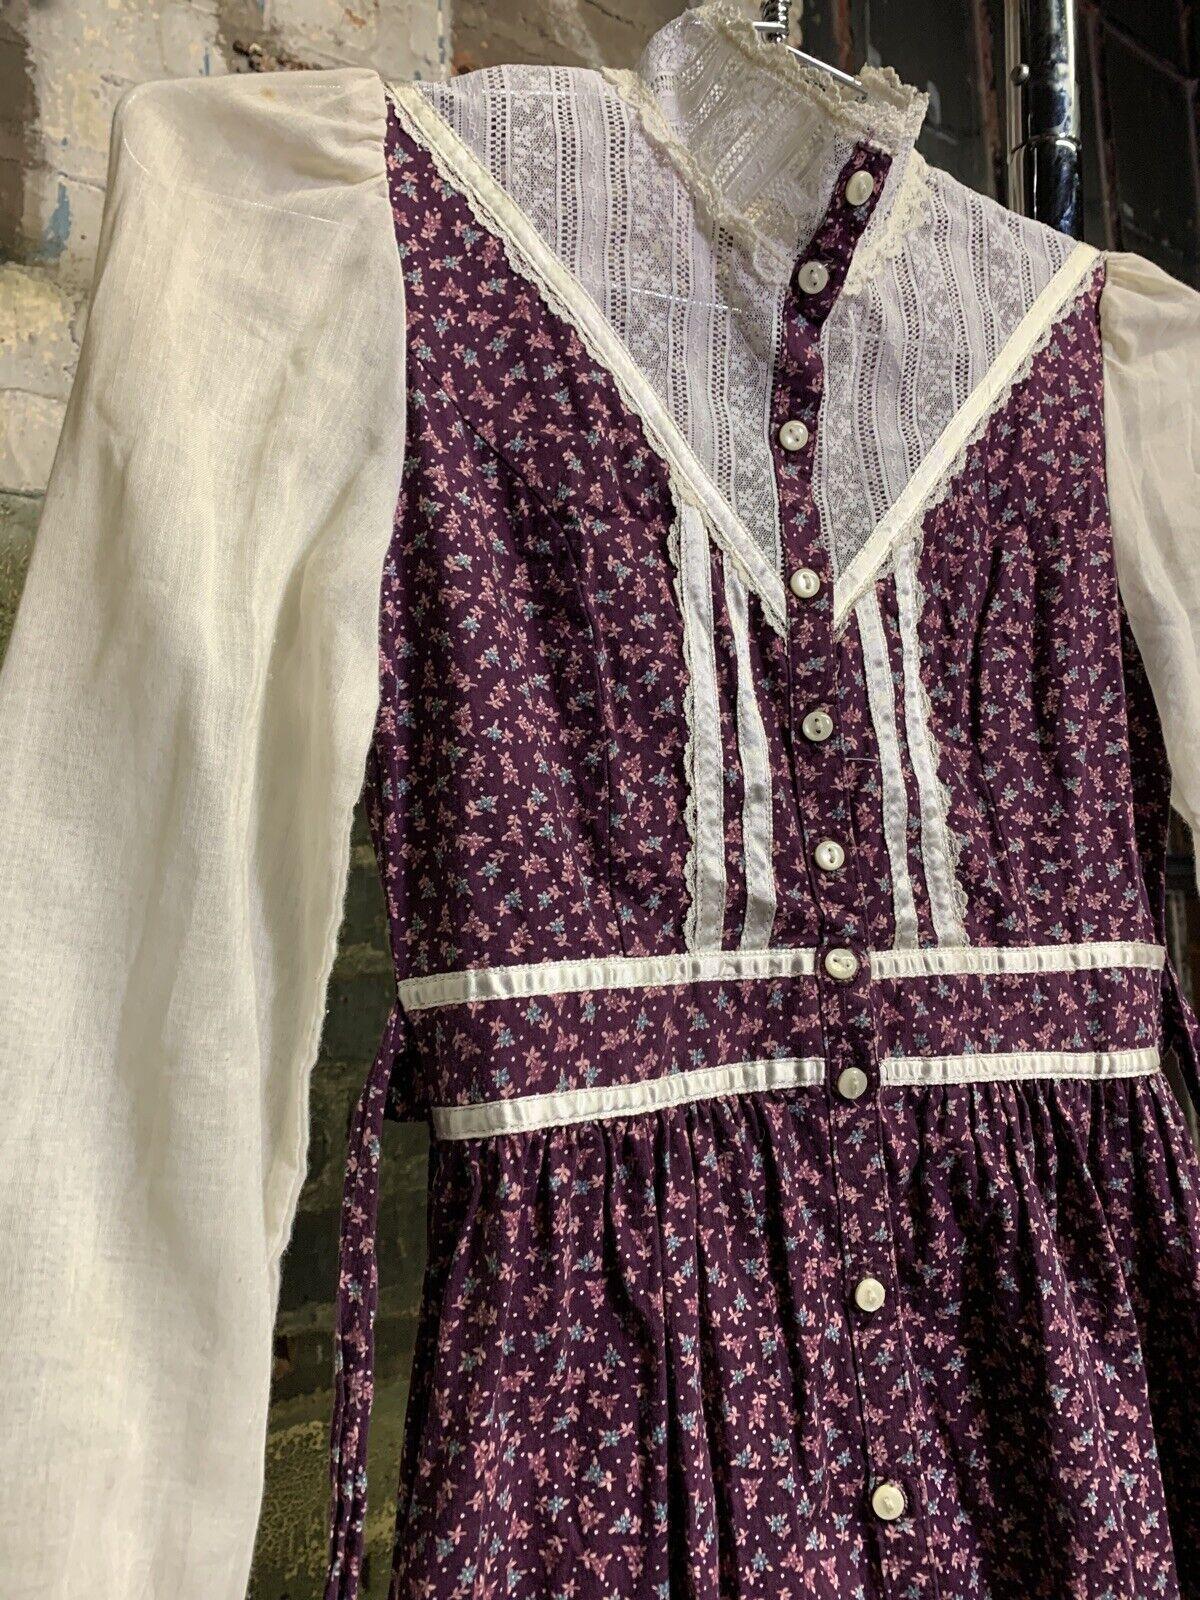 gunne sax 1970s women's vintage dress - image 2